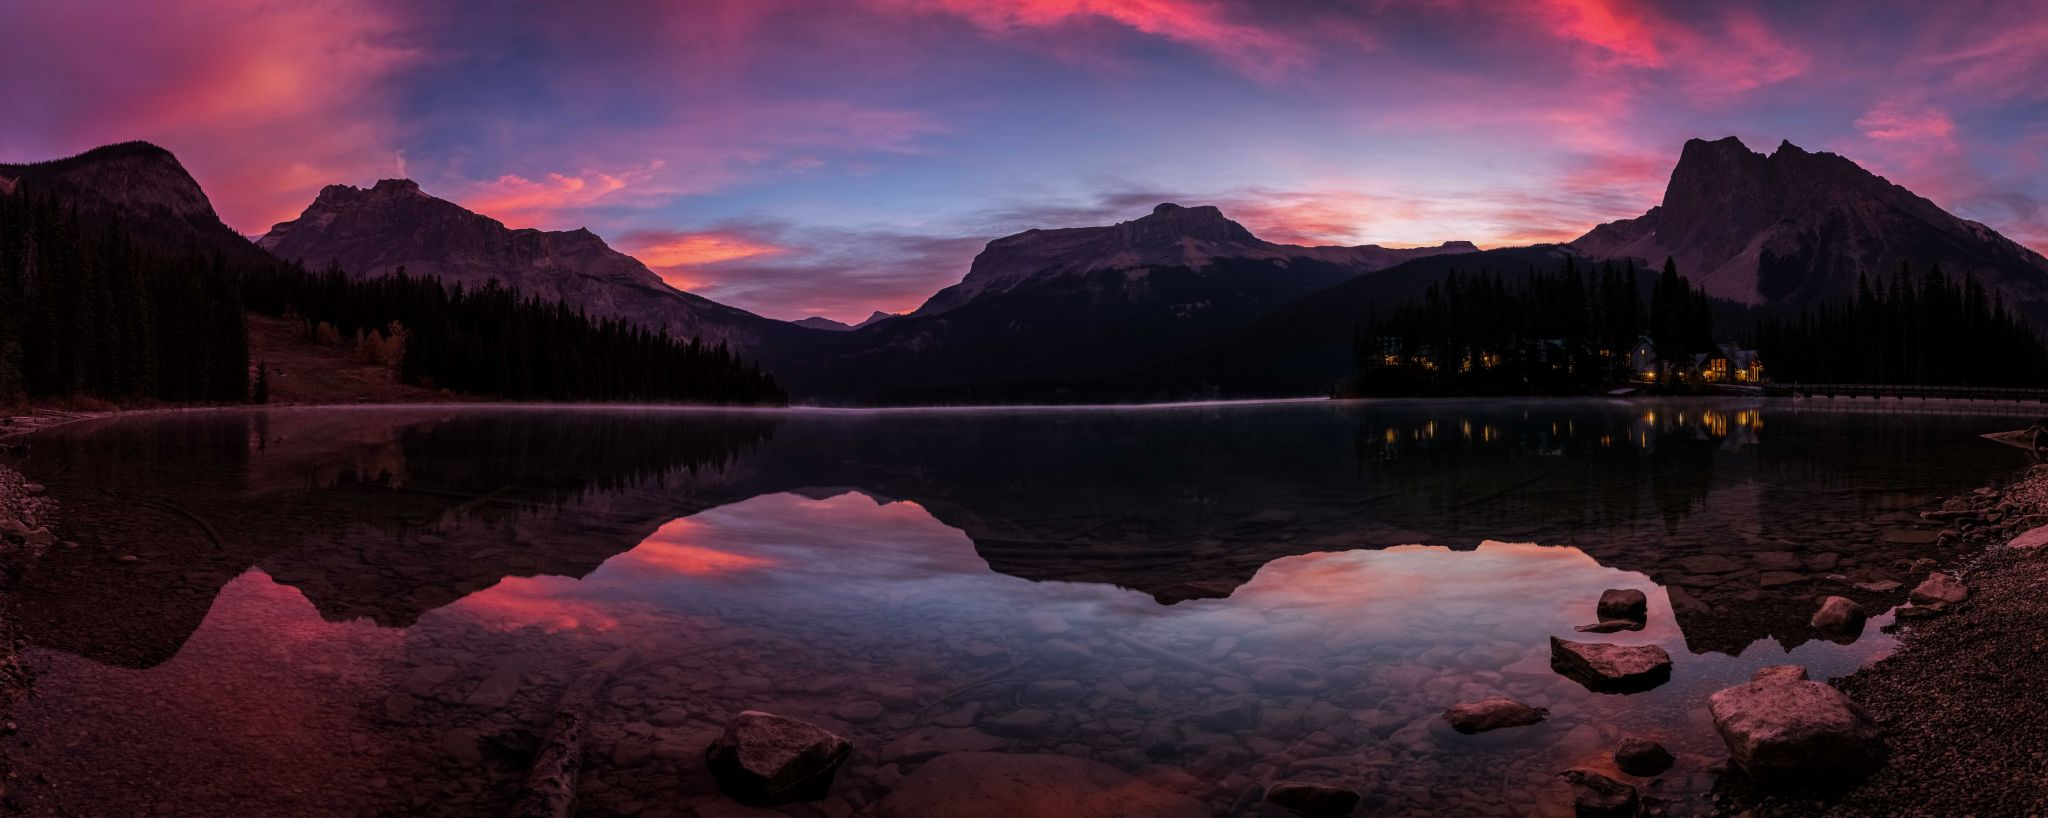 Emerald Lake, Canada, Canada